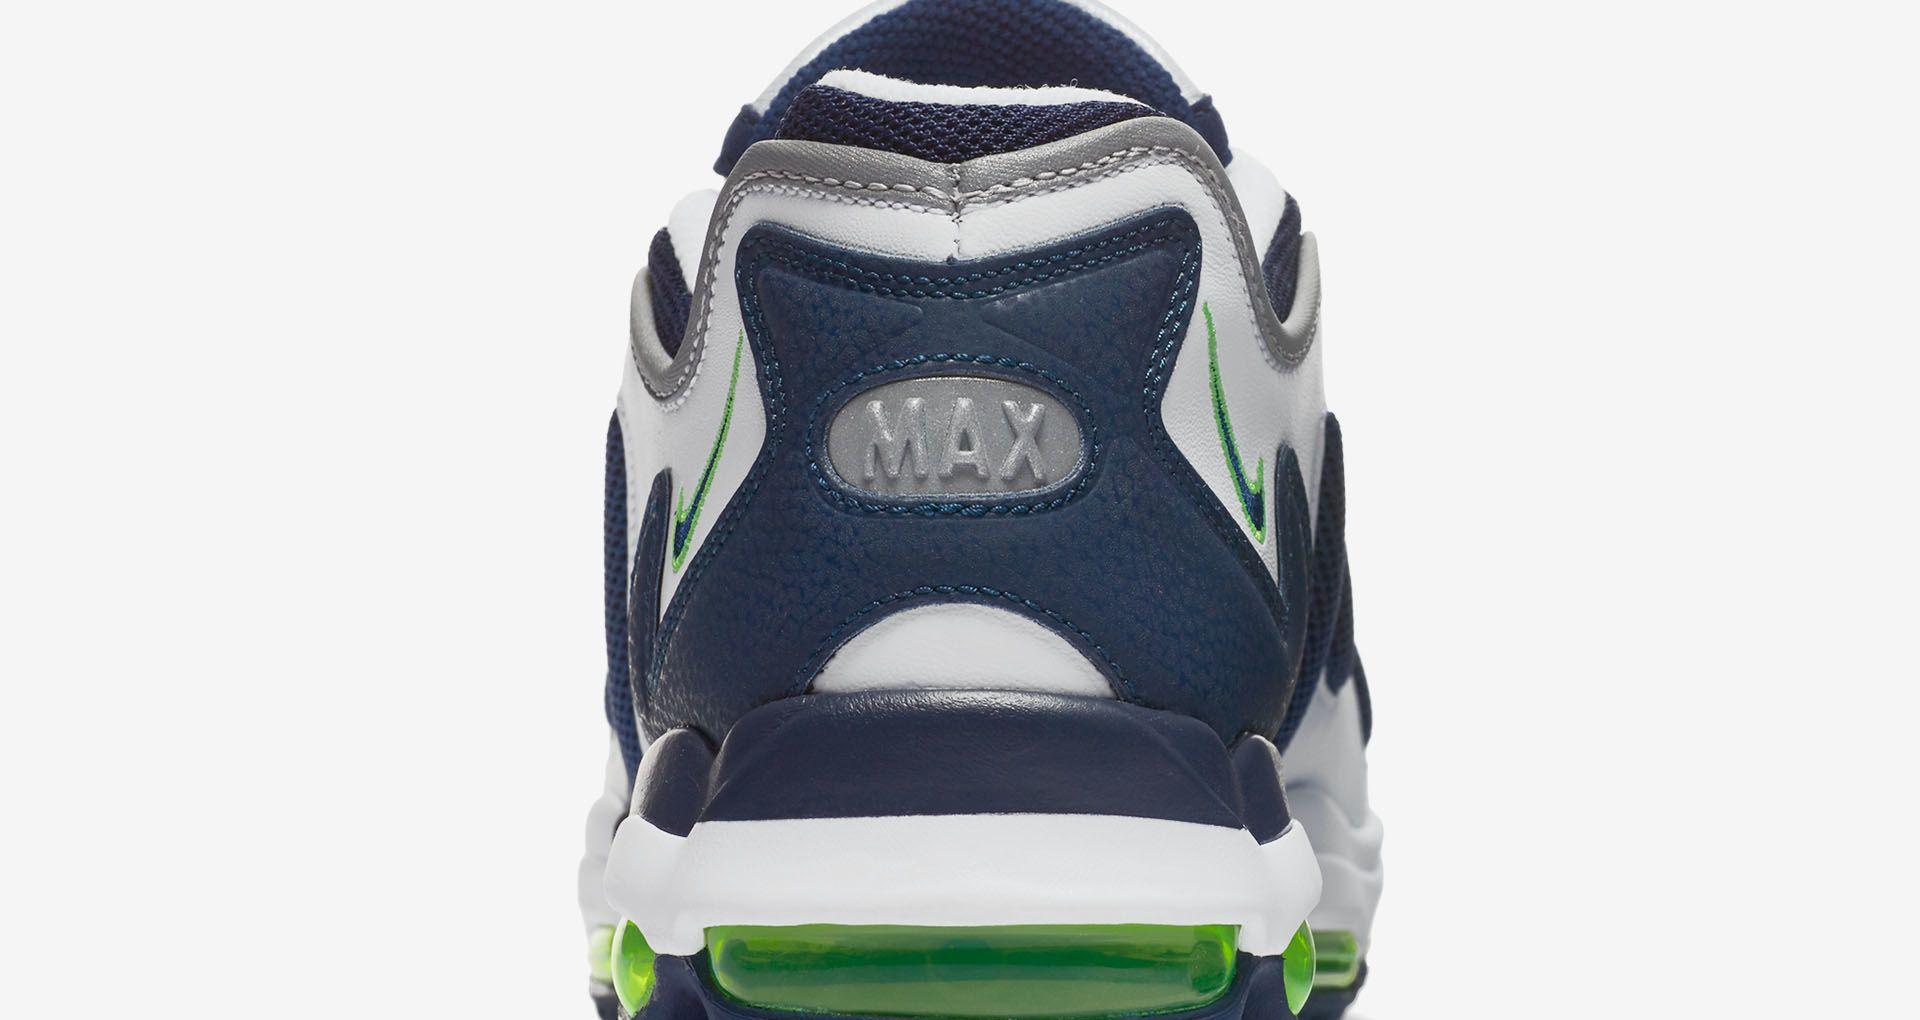 Nike Air Max 96 XX 'Scream Green'. Nike+ SNKRS